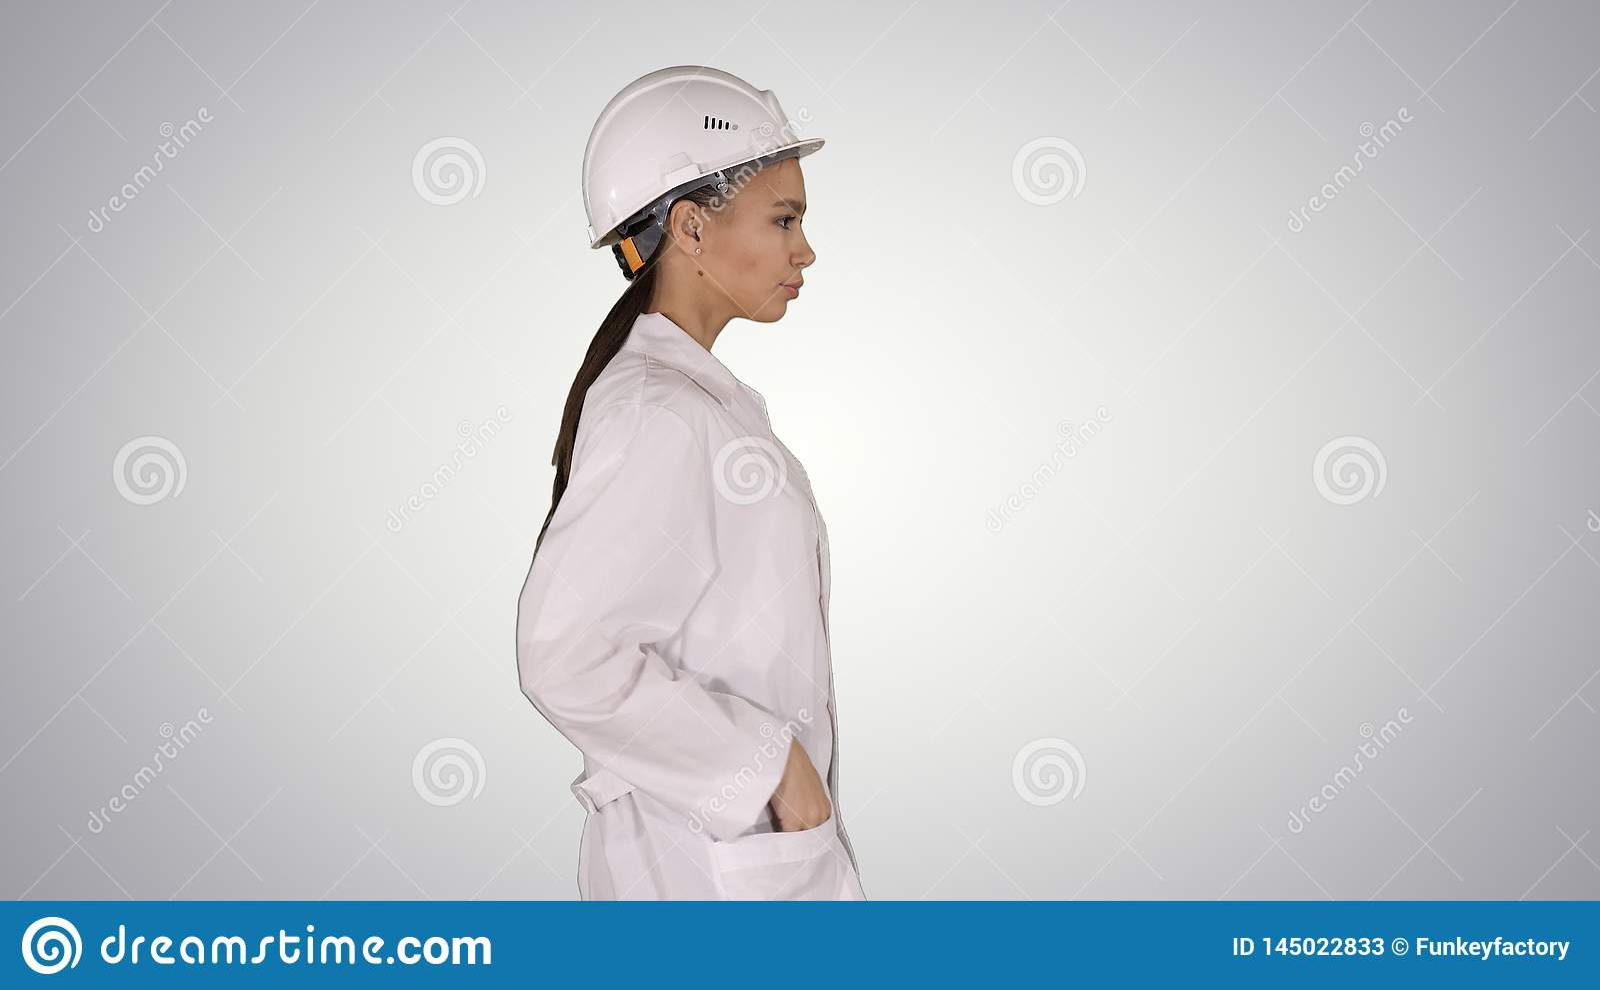 Mulher na veste branca que p?e o capacete de seguran?a sobre ao andar sobre o fundo do inclina??o